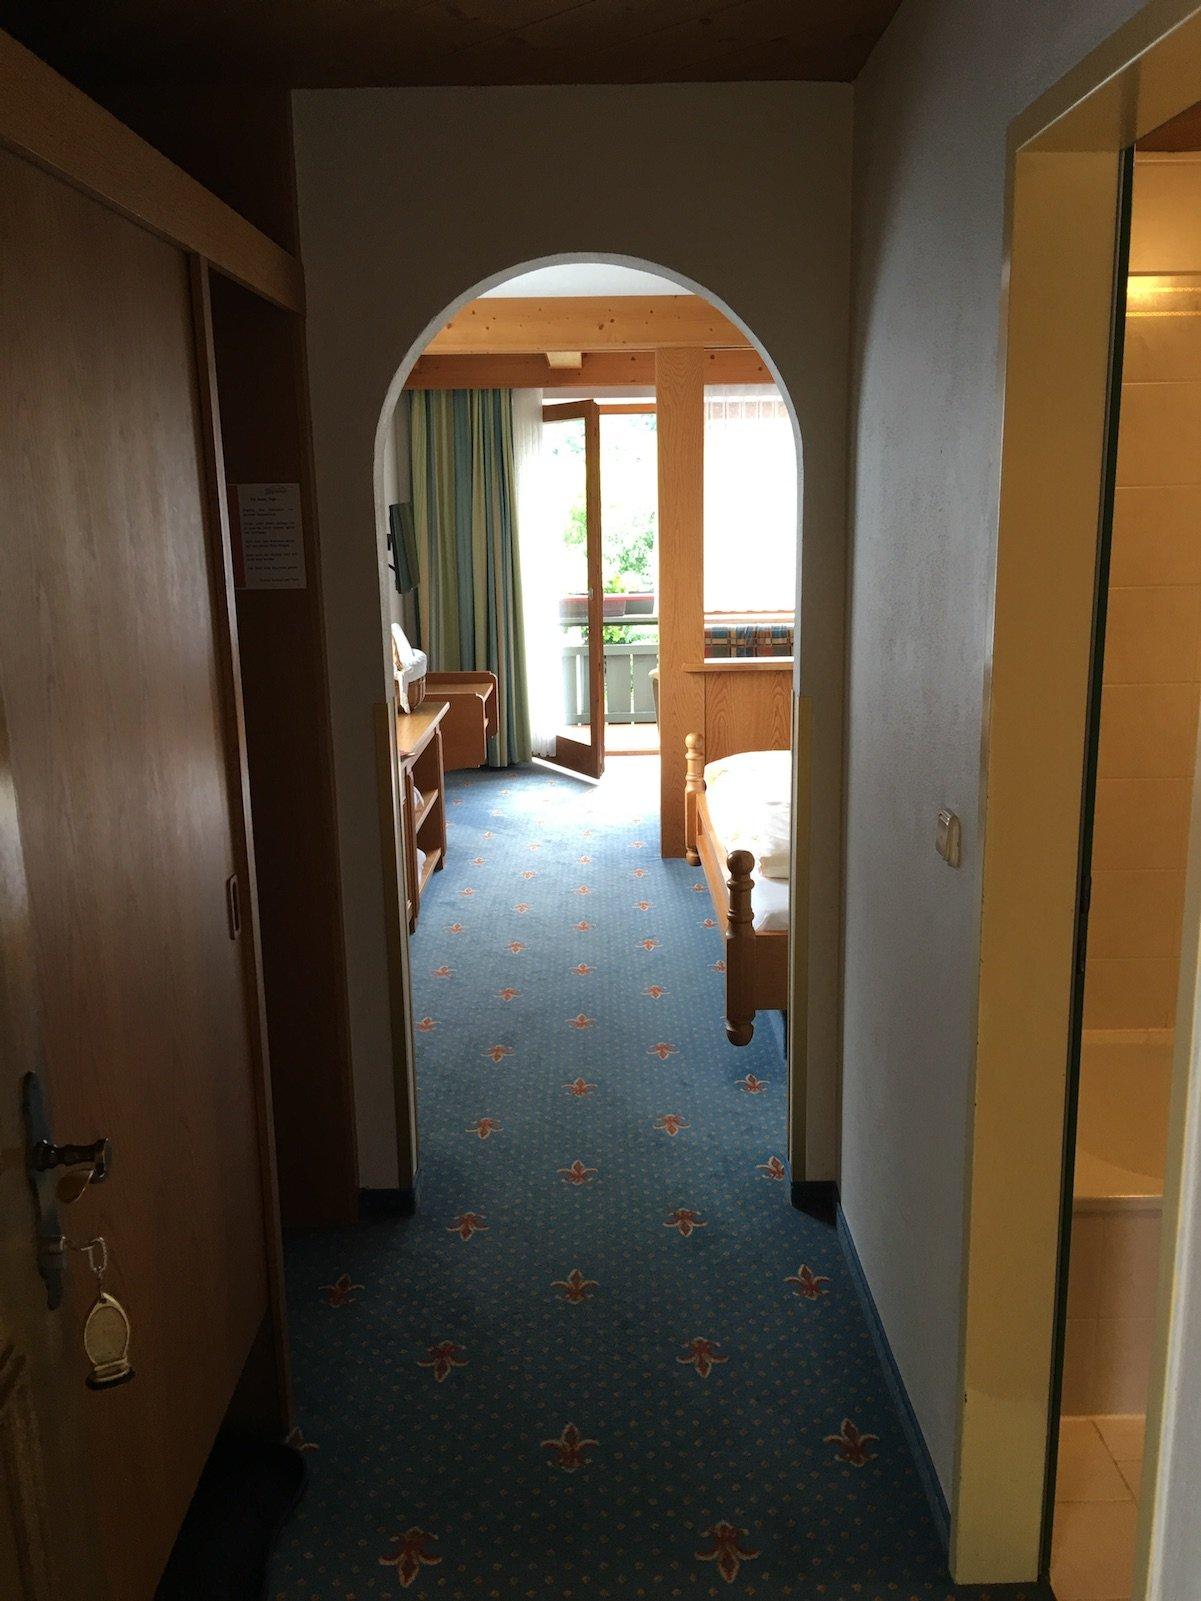 Der erste Blick ins Zimmer im Hotel Alpenrose in Elbigenalp